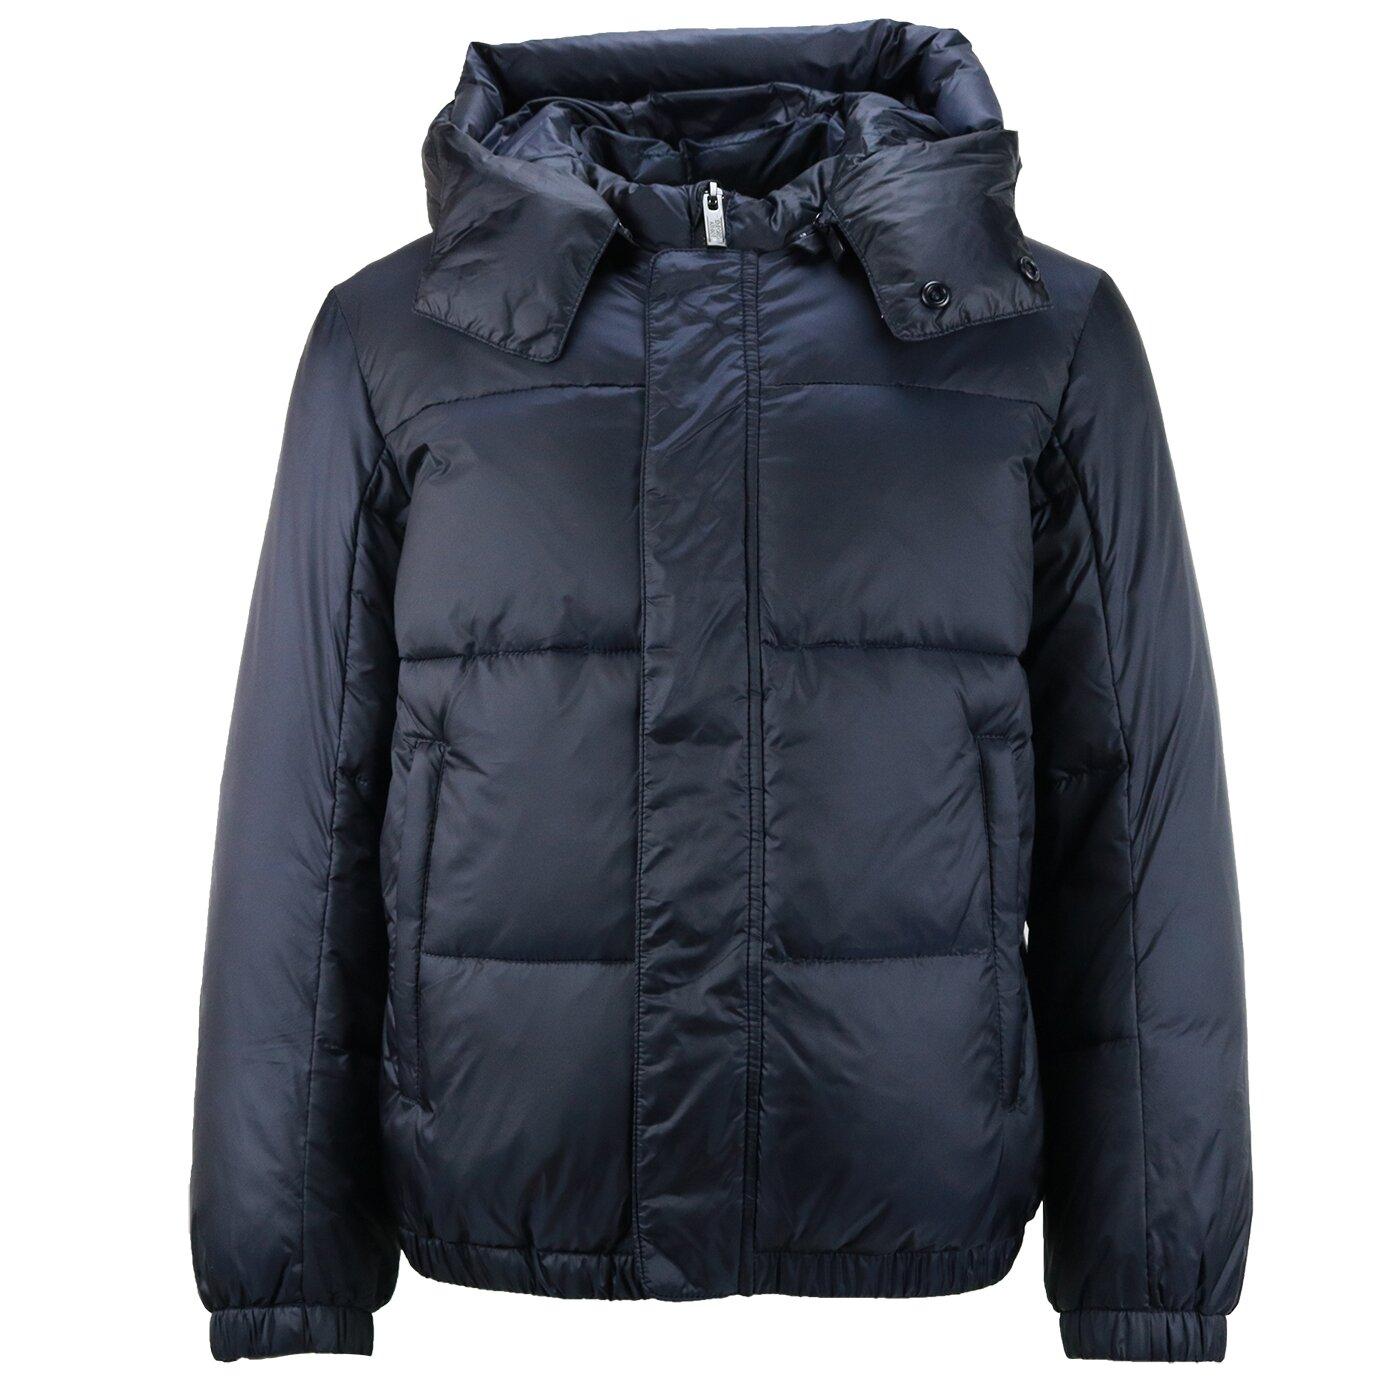 Armani Winter Jacket Navy